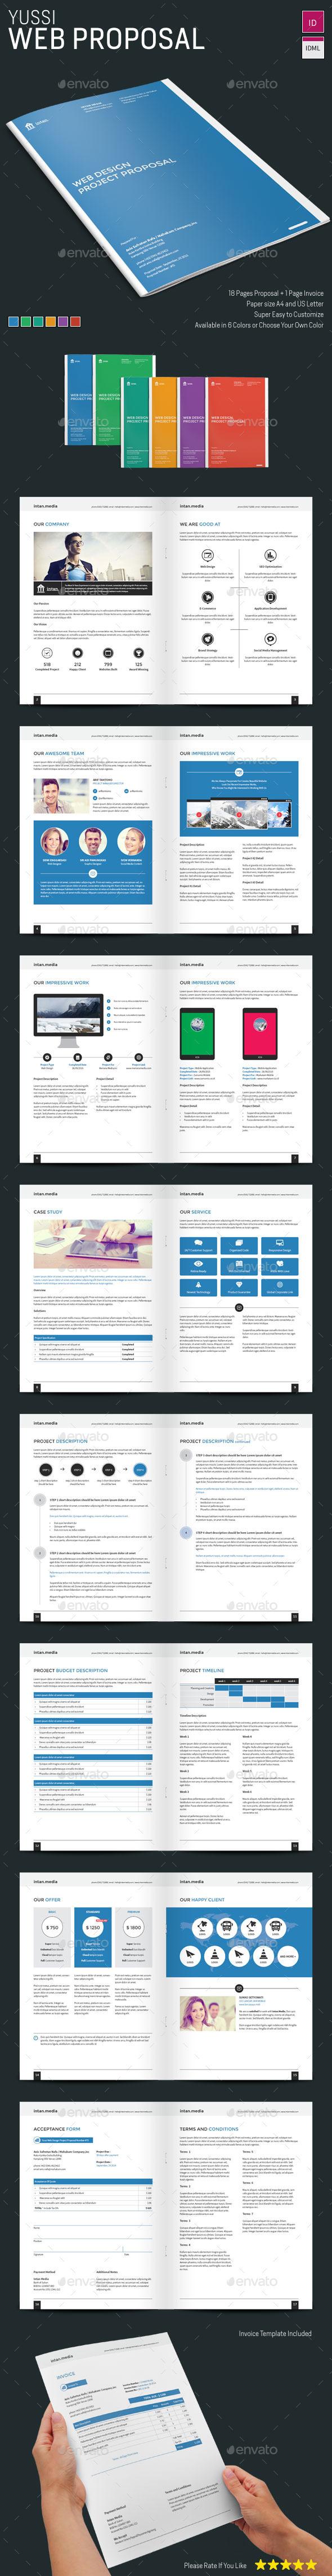 GraphicRiver Web Proposal 9093435